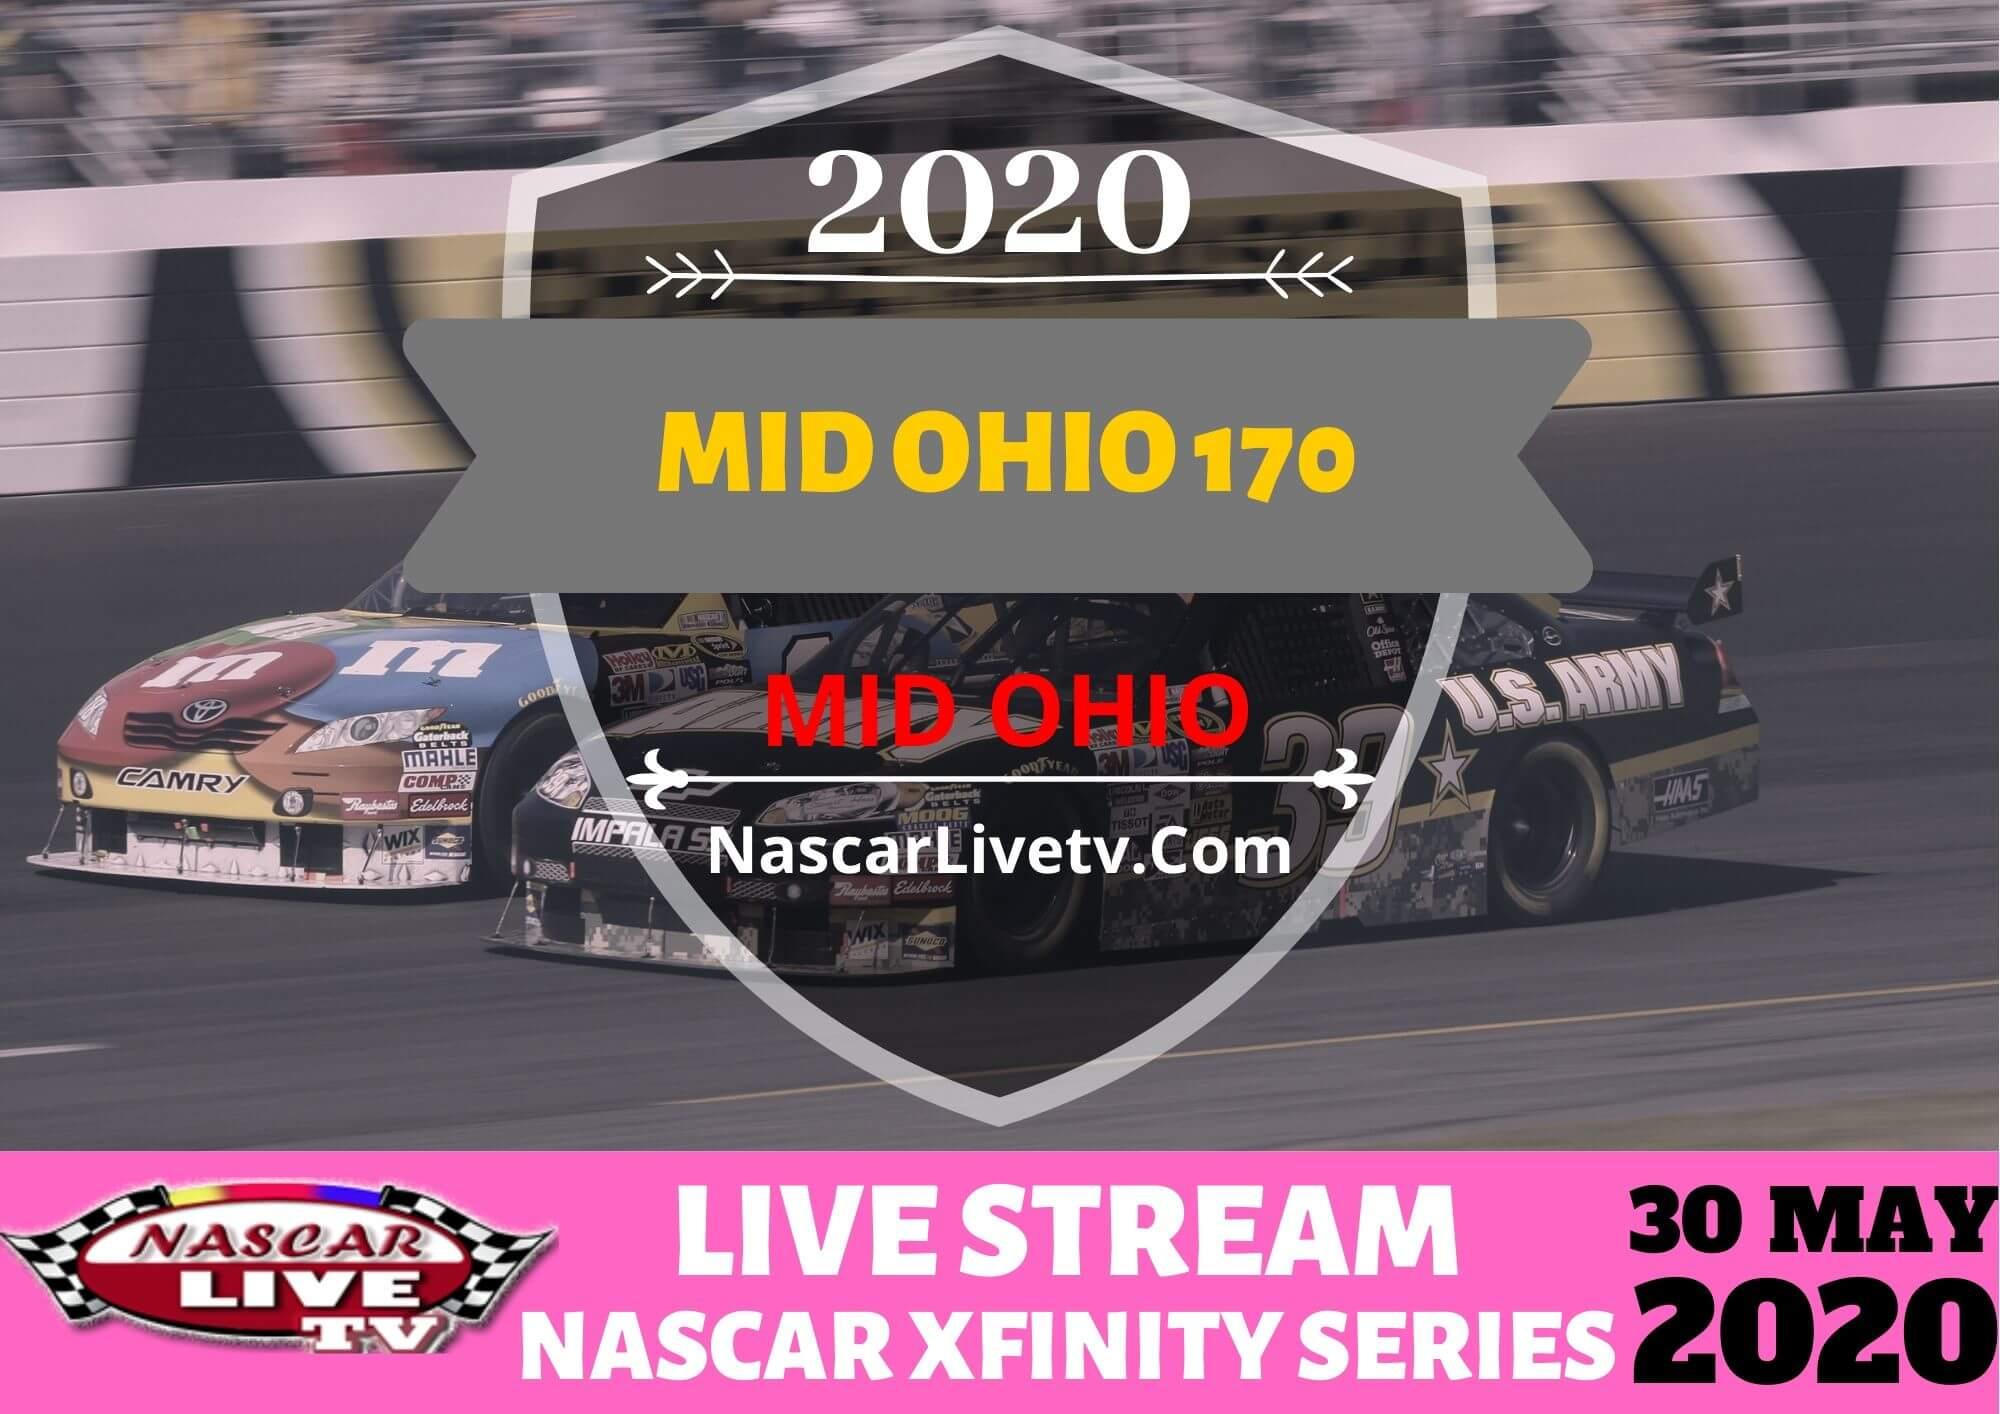 NASCAR Xfinity Mid Ohio 170 Live Stream